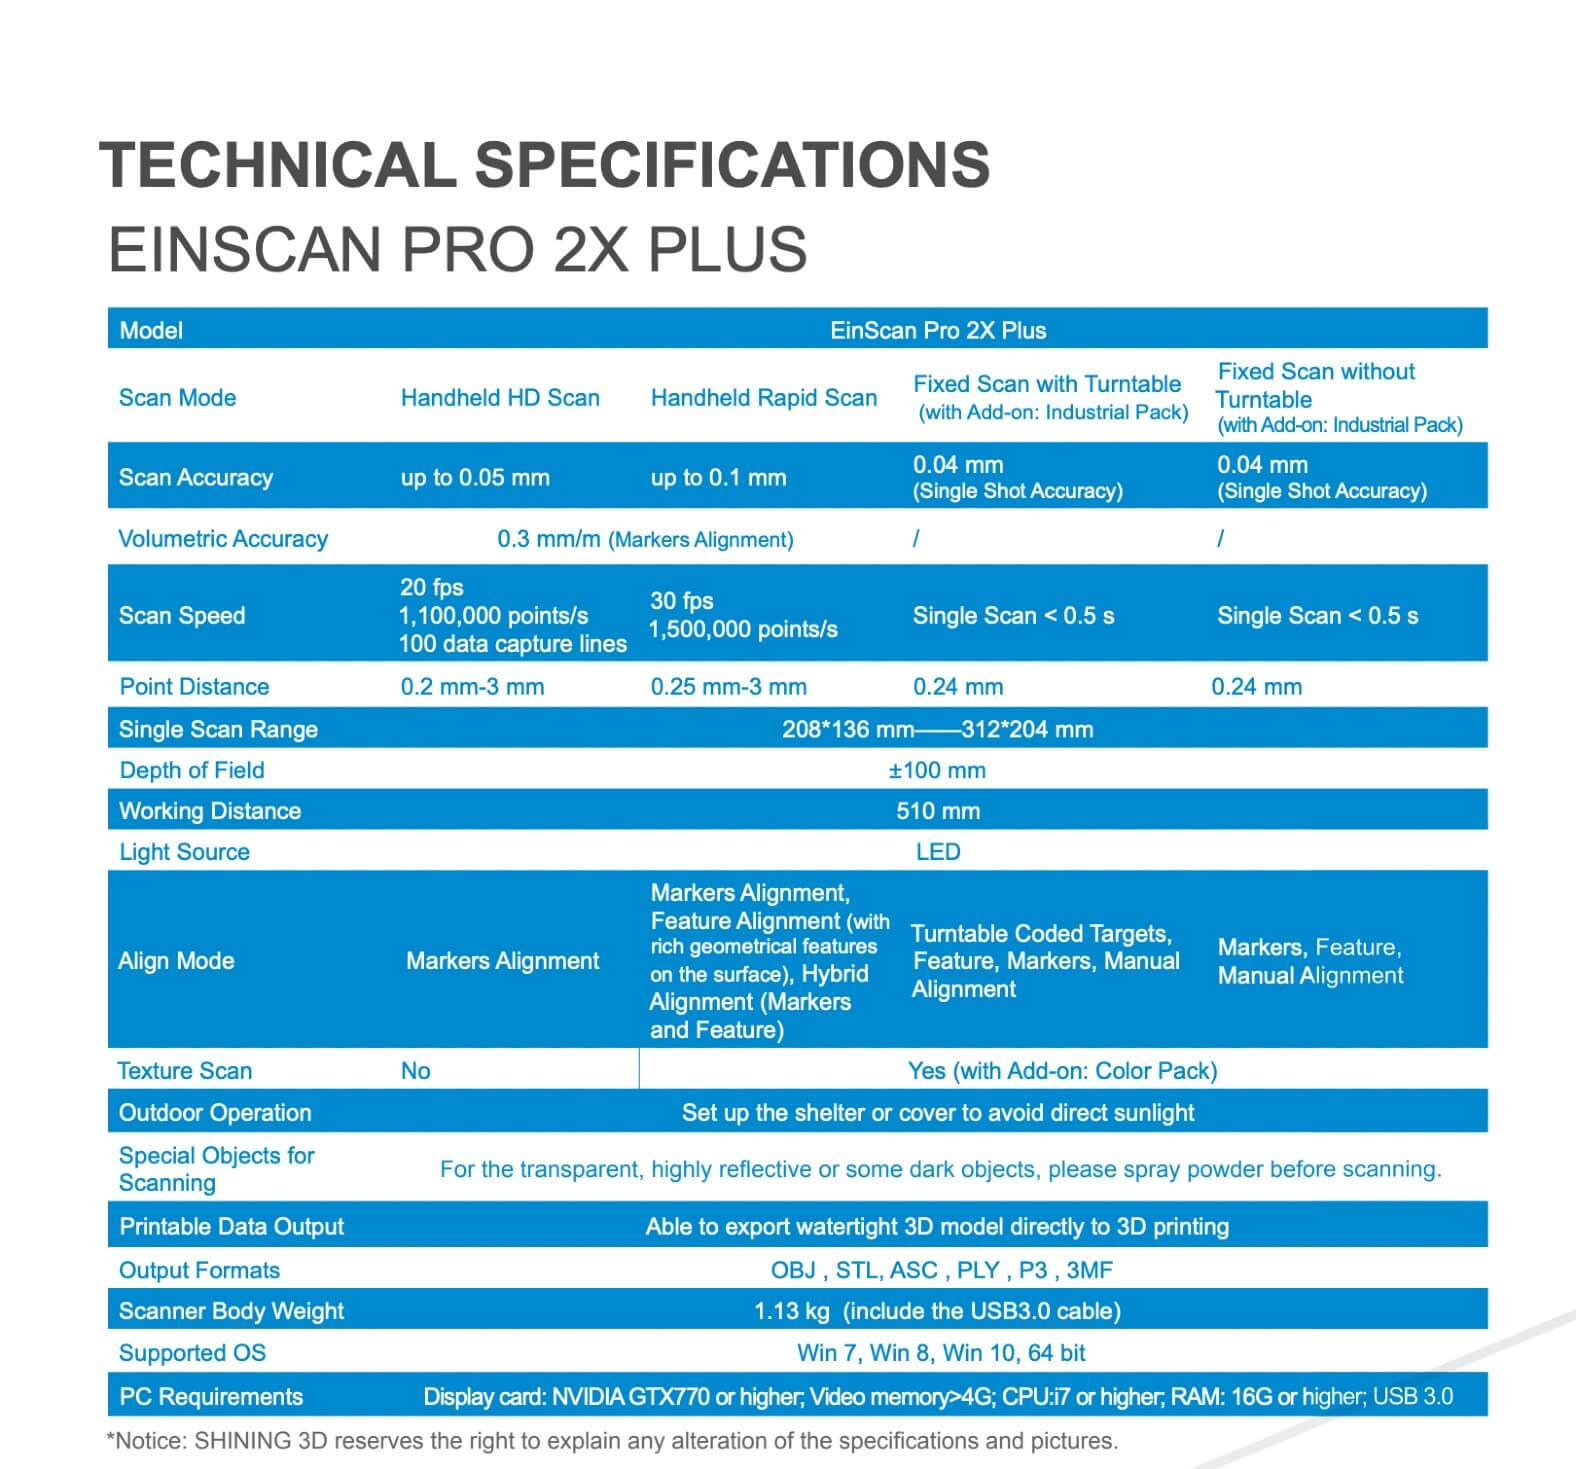 einscan pro 2x plus specification